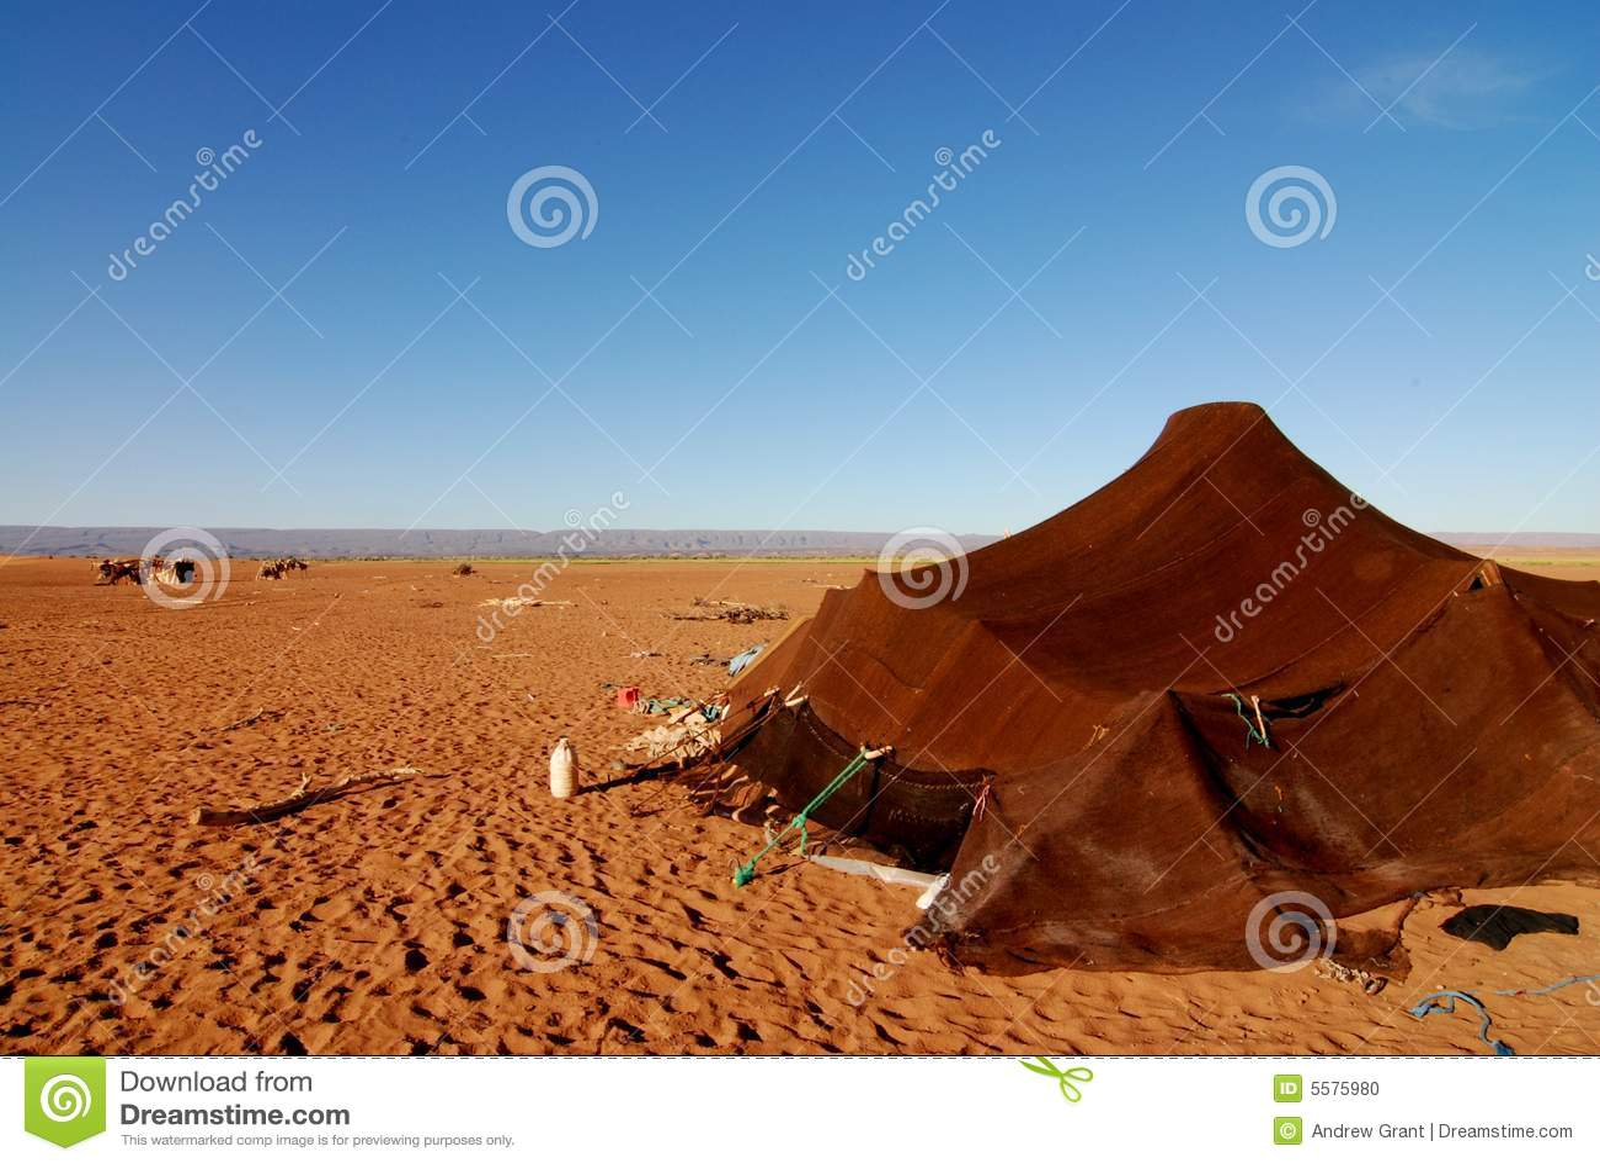 nomad tent in sahara desert stock photo image 5575980